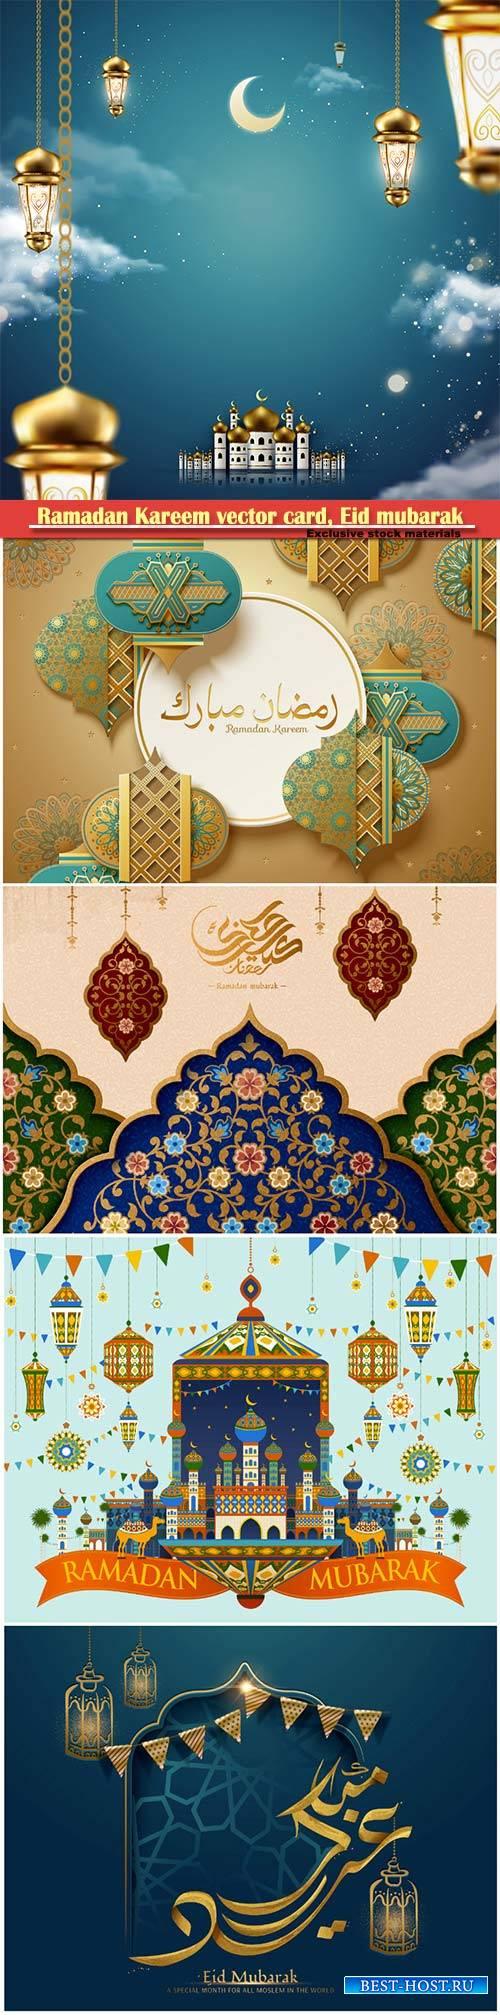 Ramadan Kareem vector card, Eid mubarak calligraphy design templates # 31